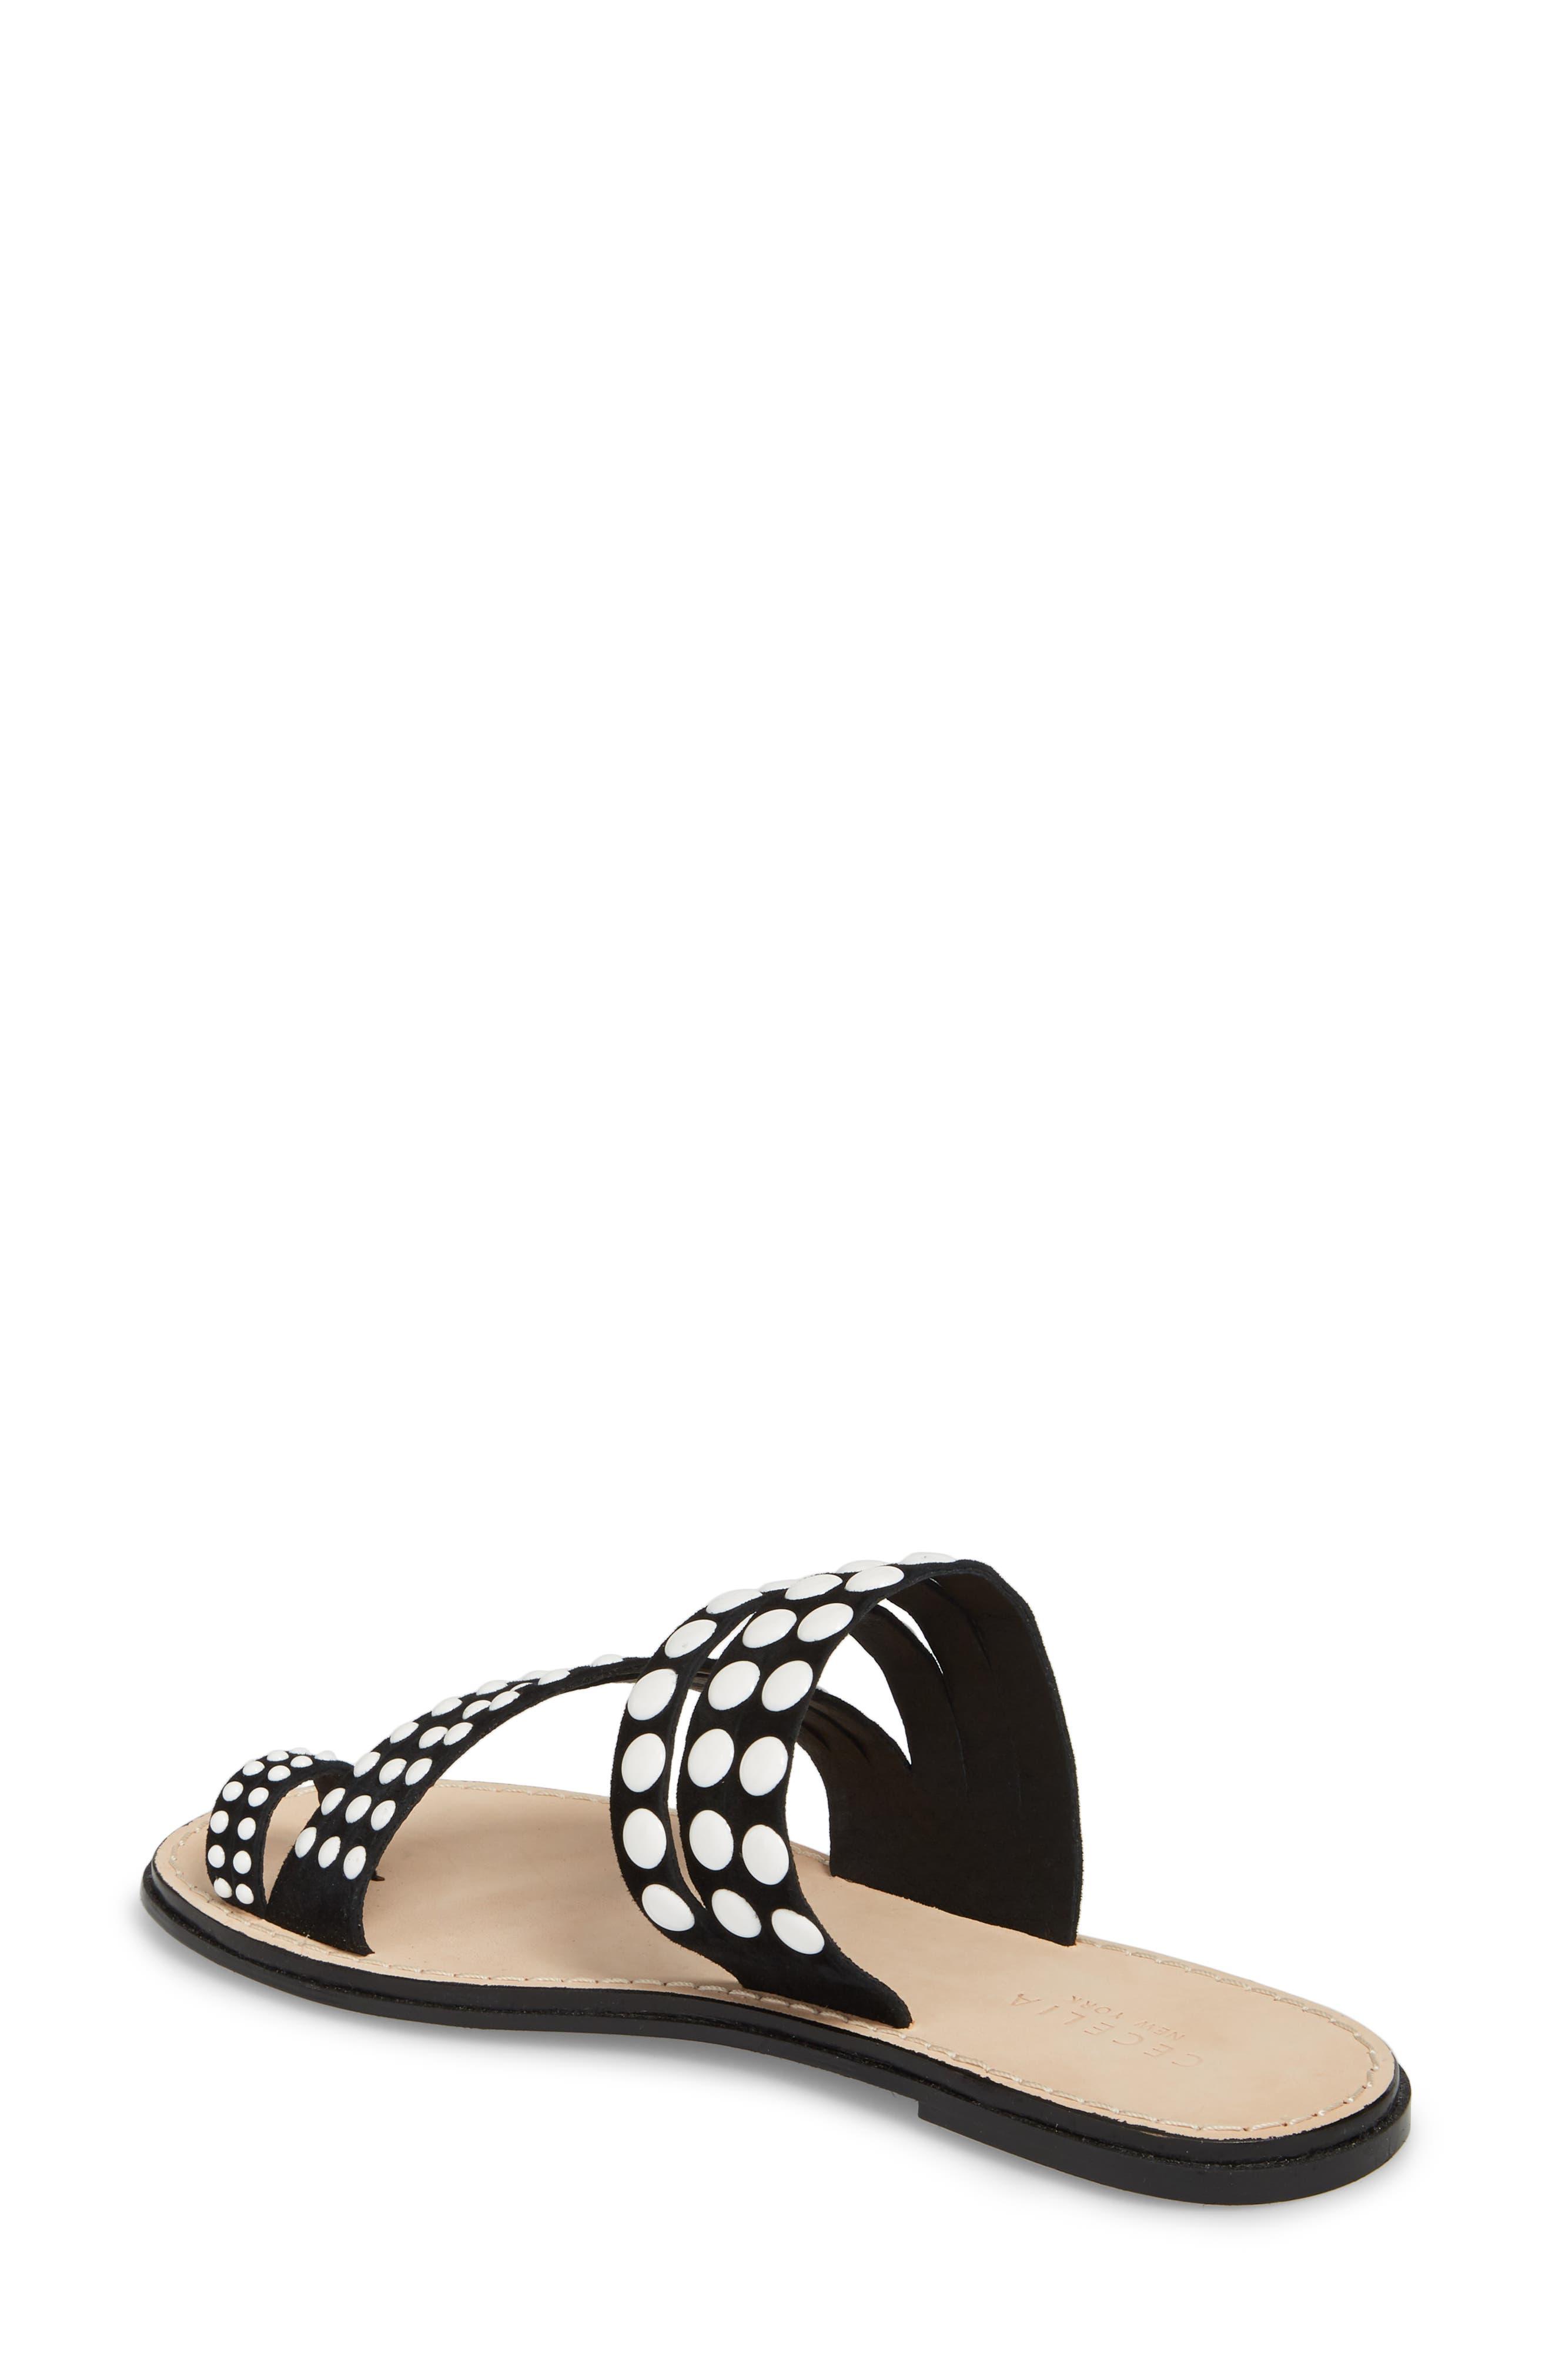 Pezz Studded Sandal,                             Alternate thumbnail 2, color,                             001